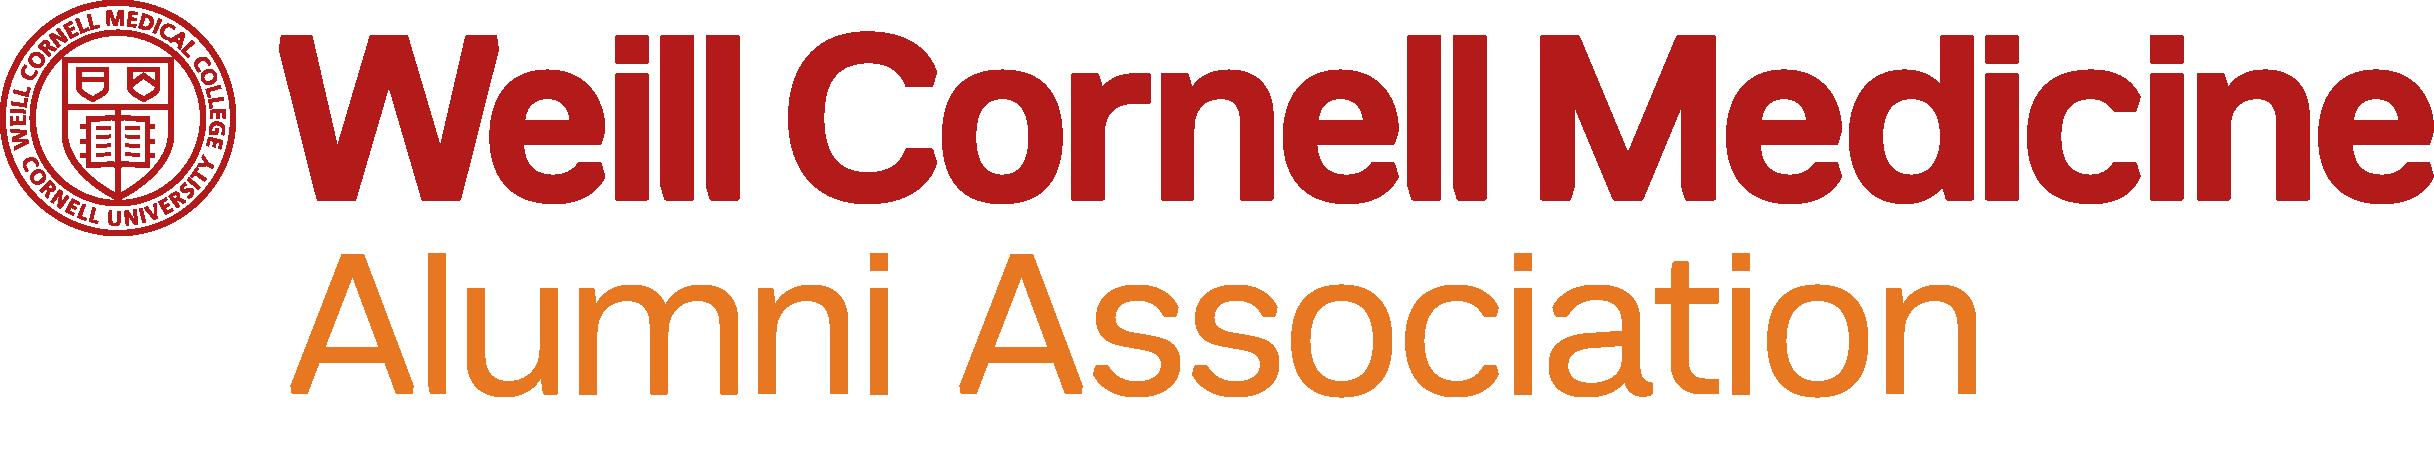 Weill Cornell Medicine Alumni Association Logo